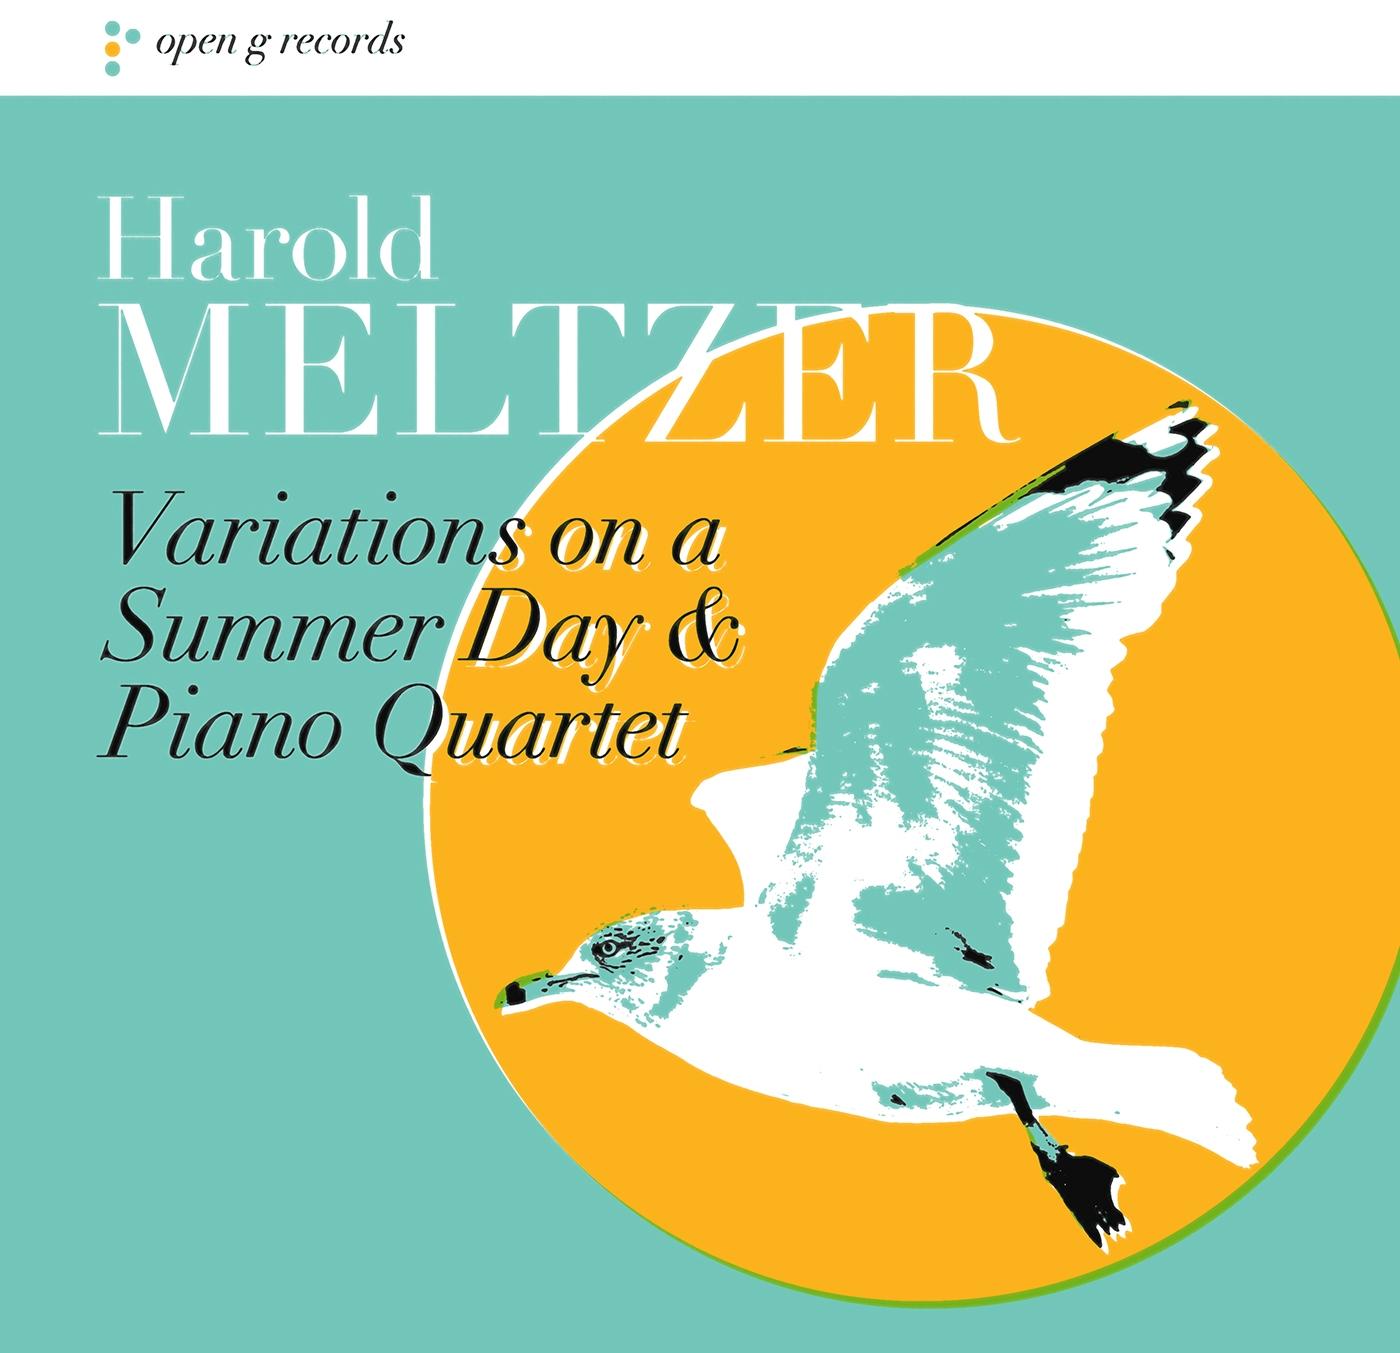 meltzer-cover-1400x1400.jpg